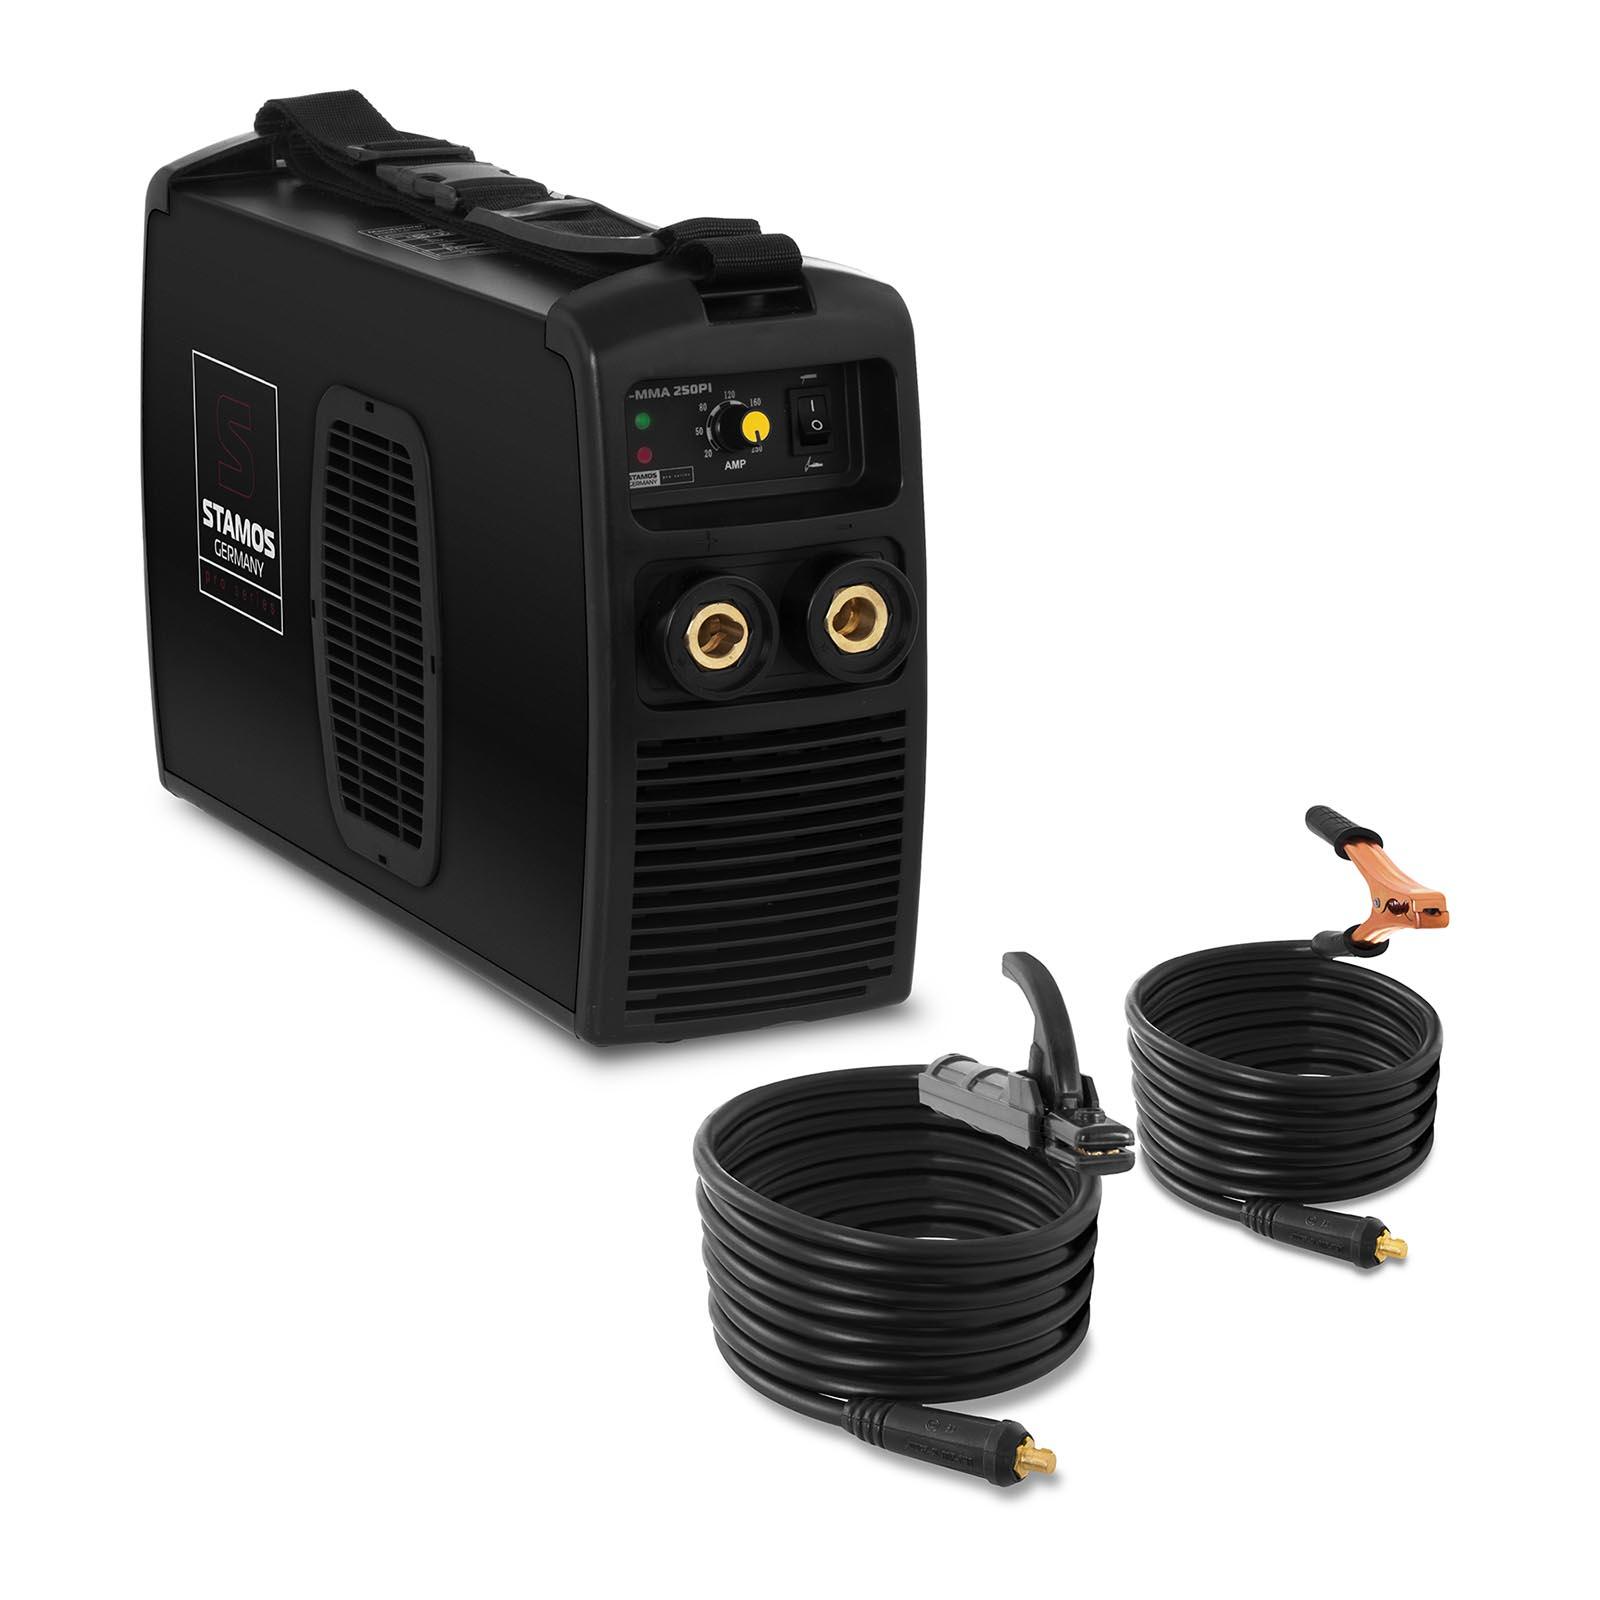 Stamos Elektroden Schweißgerät - 250 A - IGBT - 80 % ED